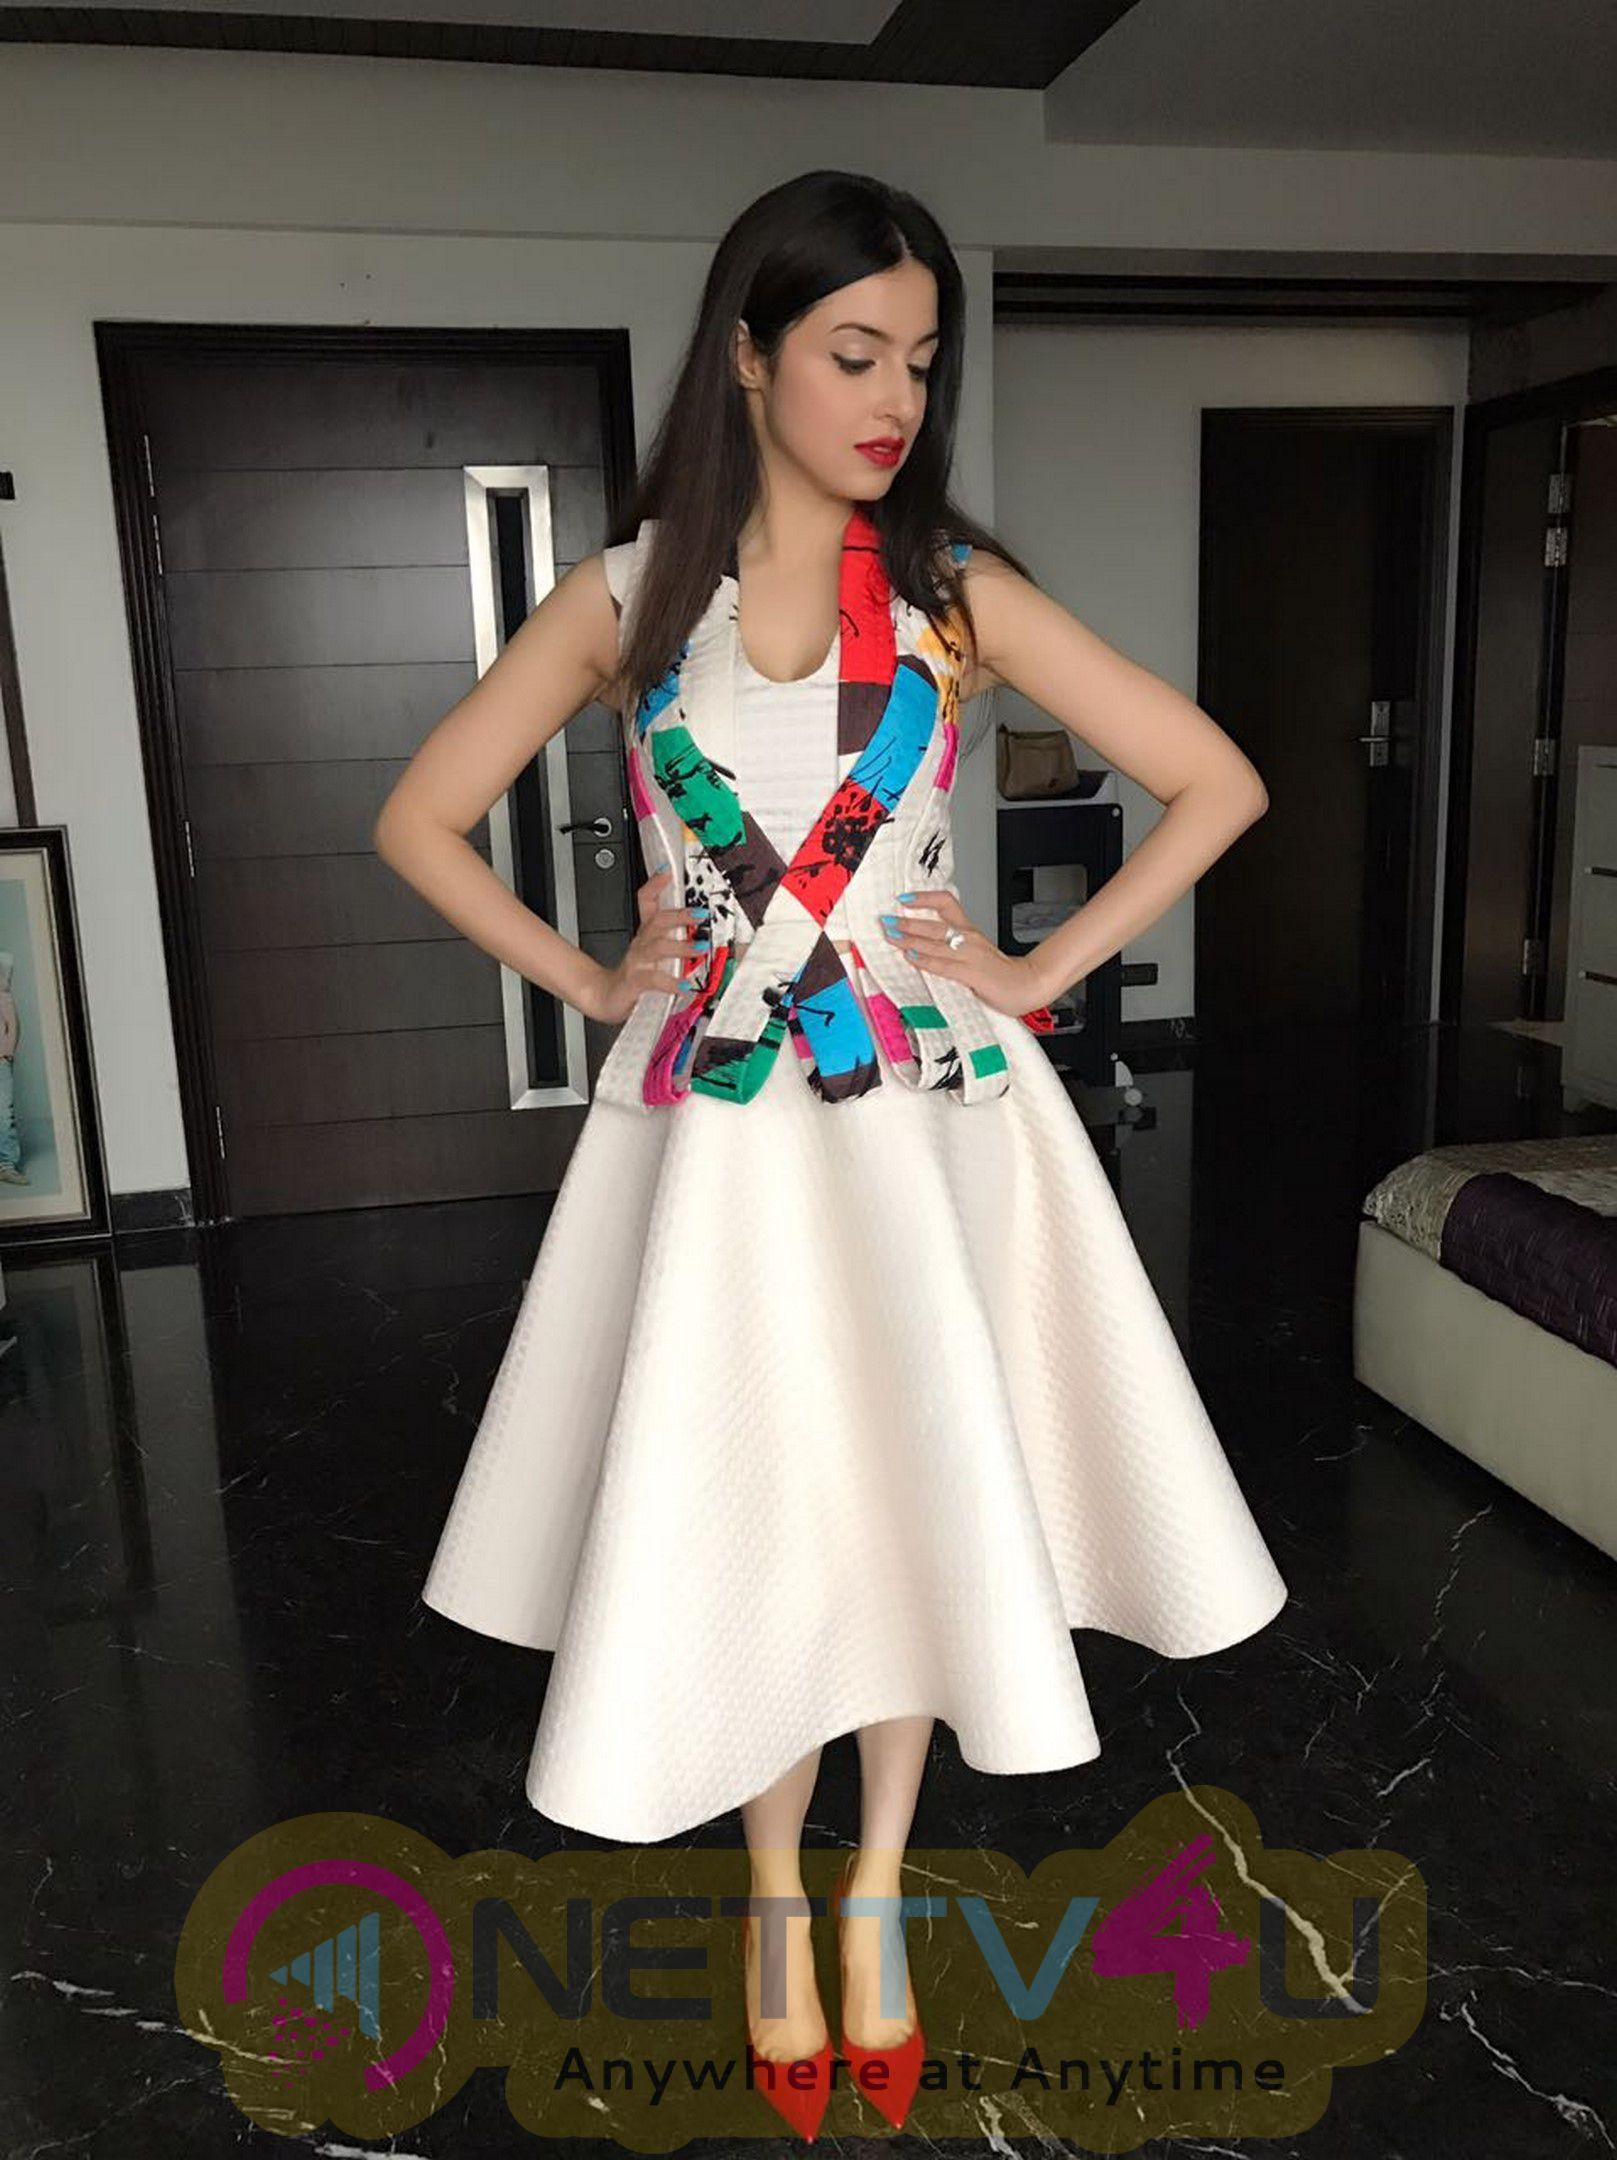 Divya Khosla Kumar Launches Shine Young 2016 In A Tanieya Khanuja Outfit & Nails It Stills Hindi Gallery